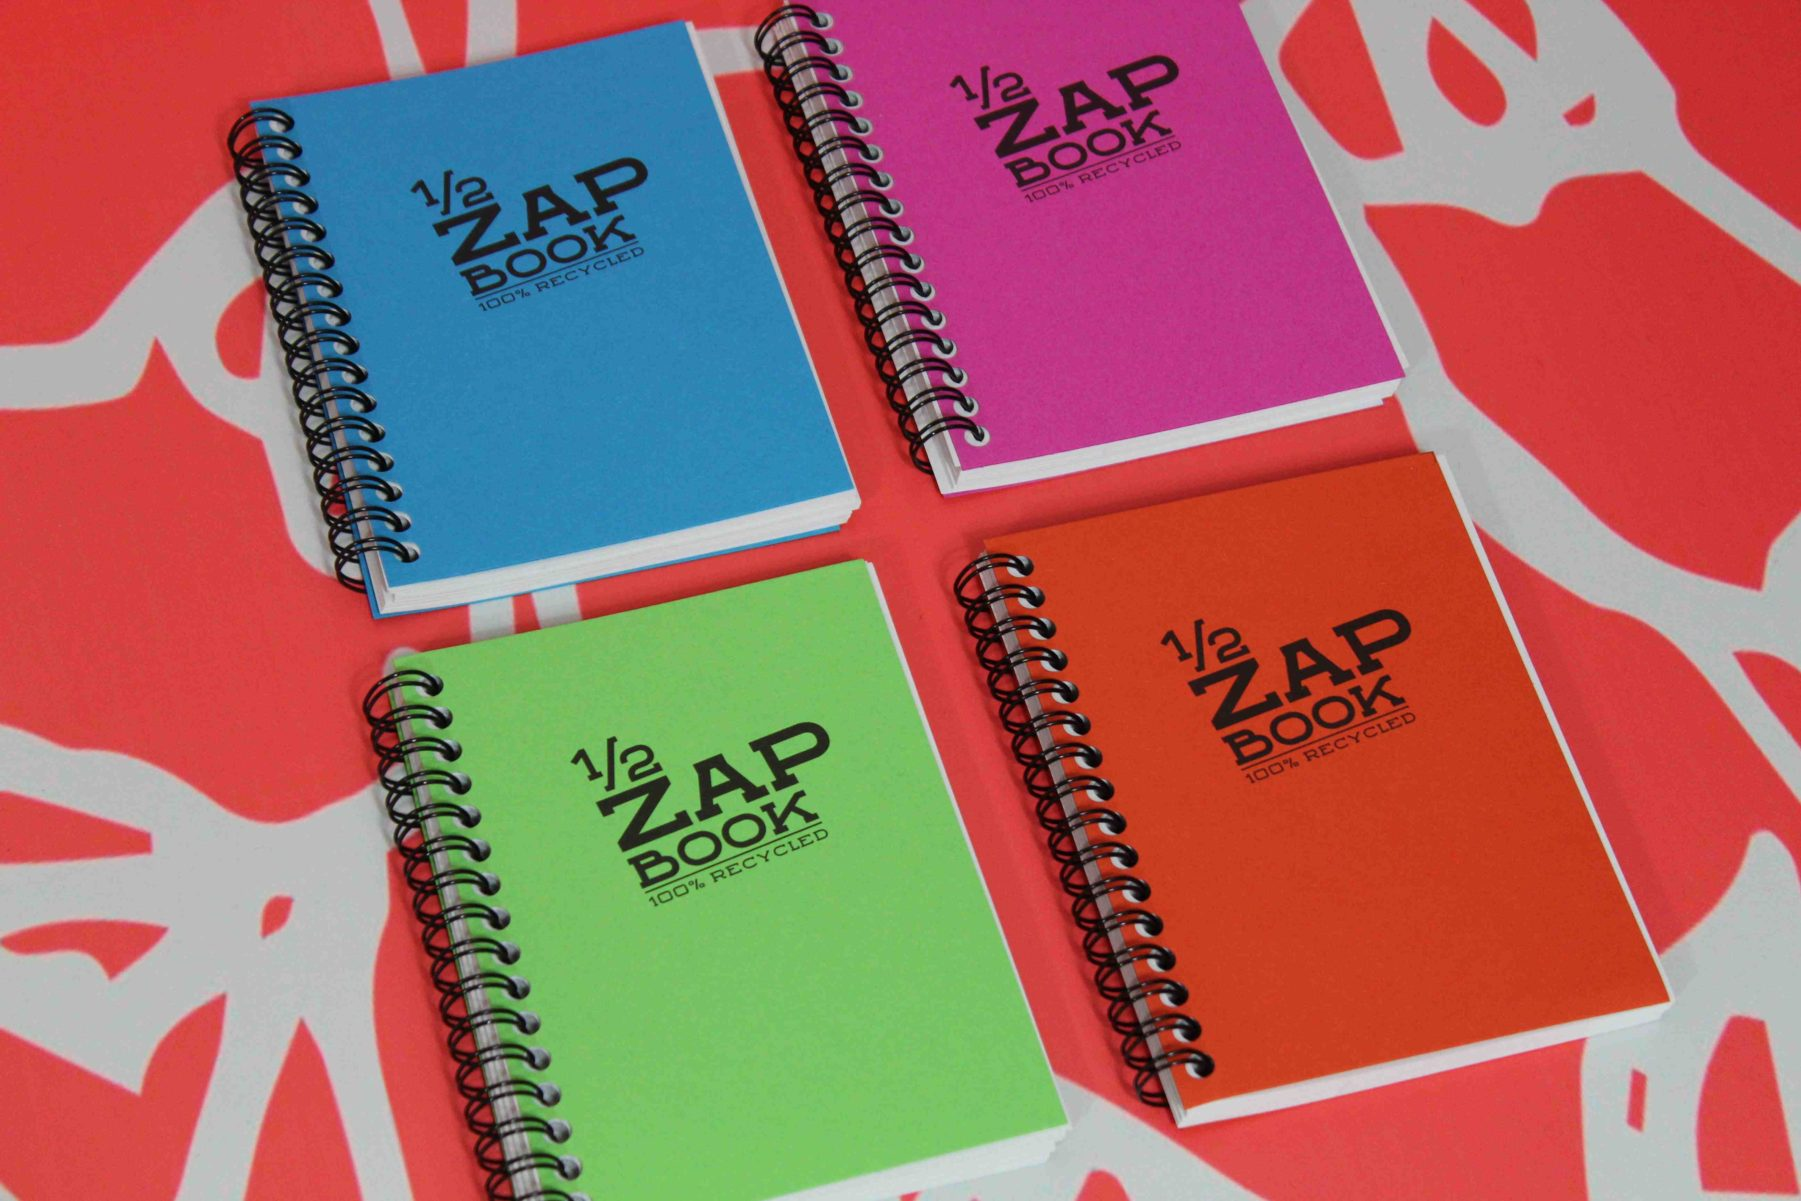 zap book